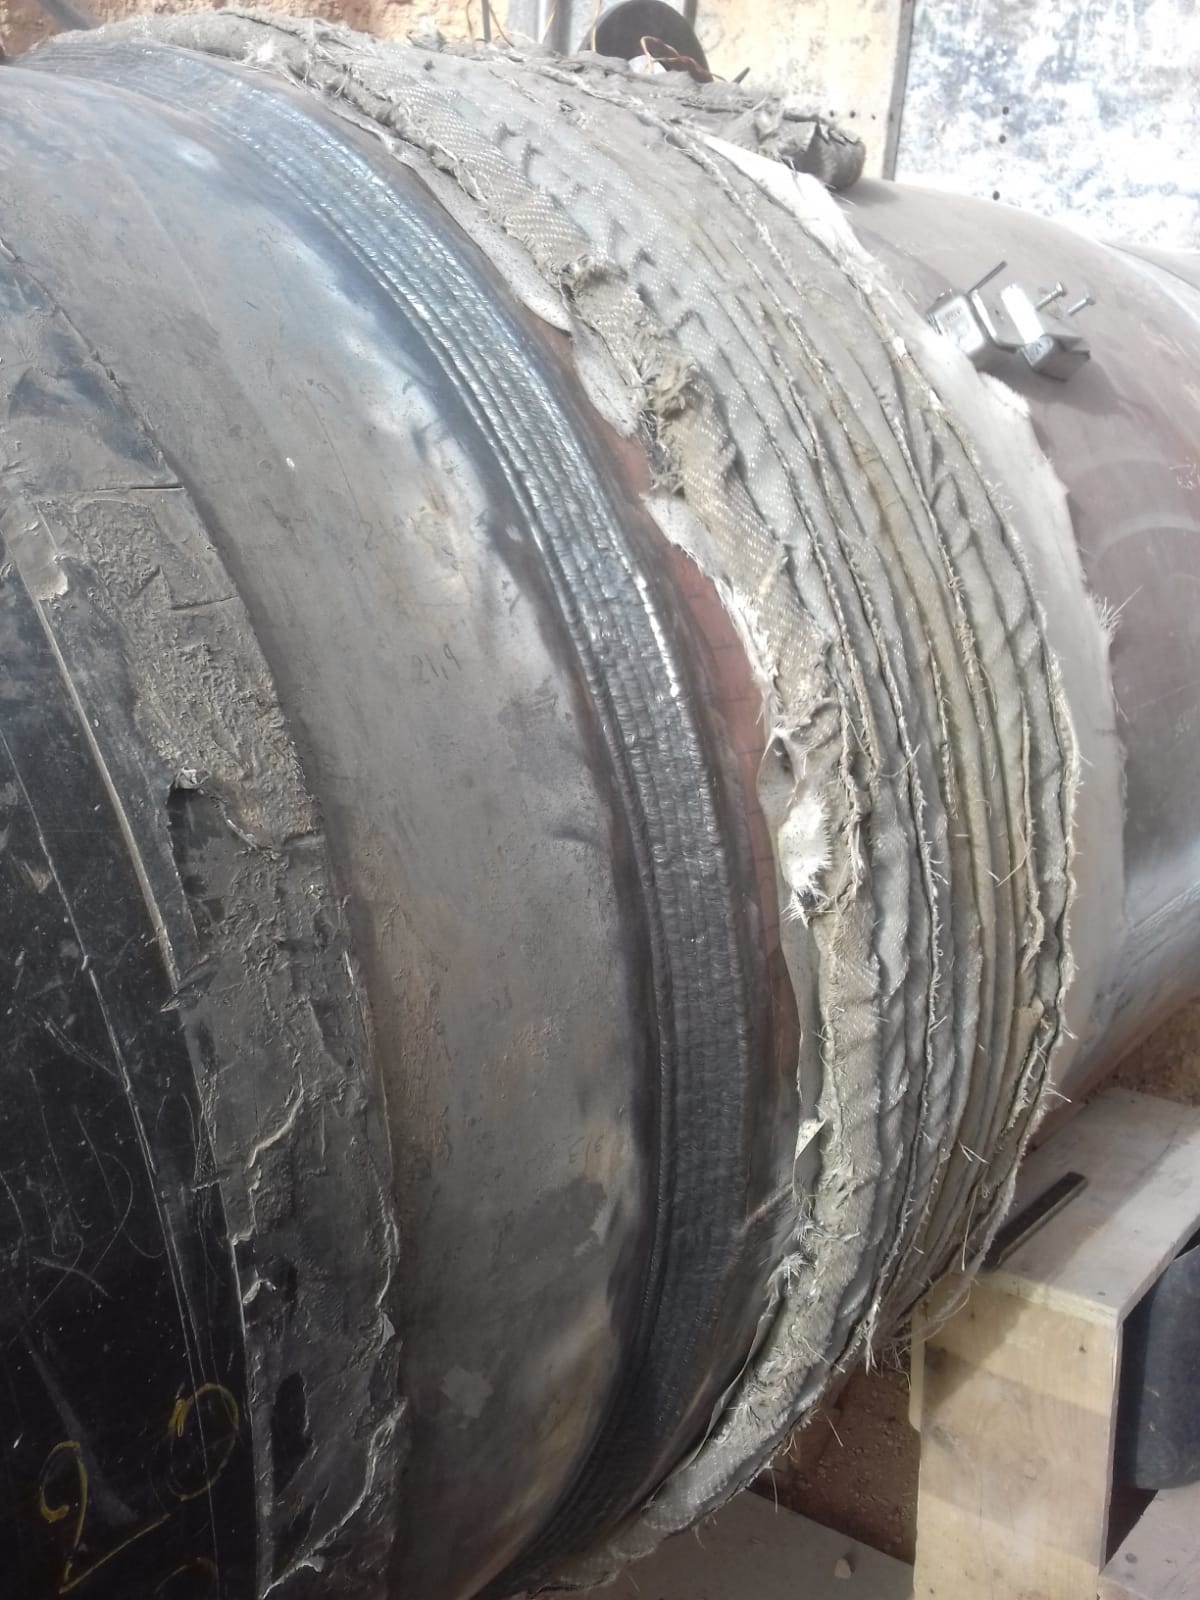 Permanent pipeline repair during full operation